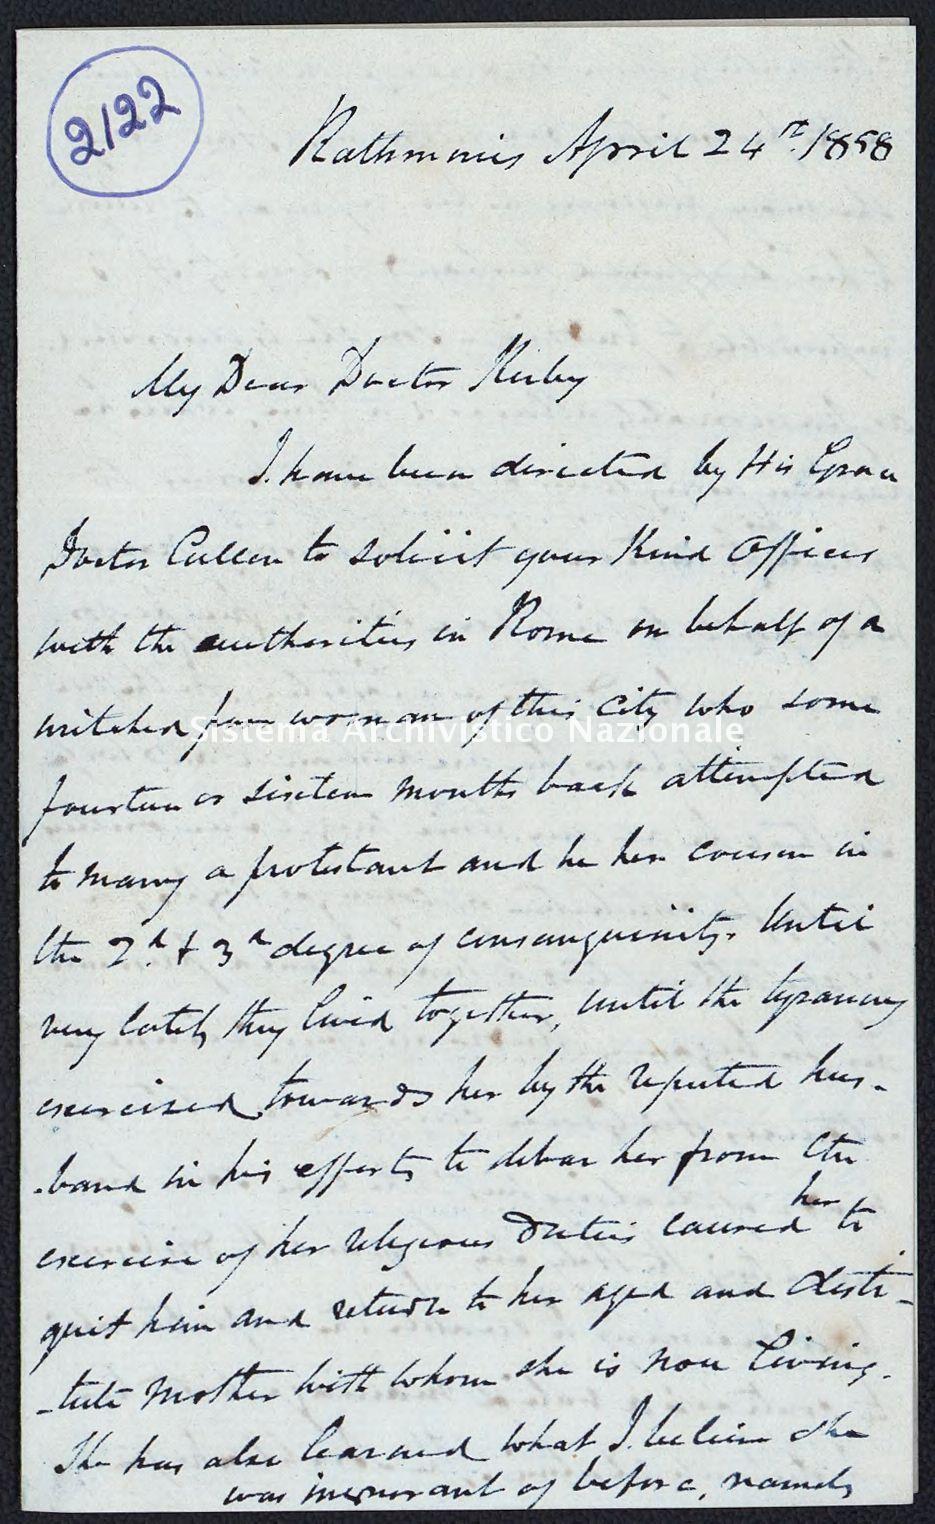 Pontificio Collegio Irlandese - Kirby_1858_2122